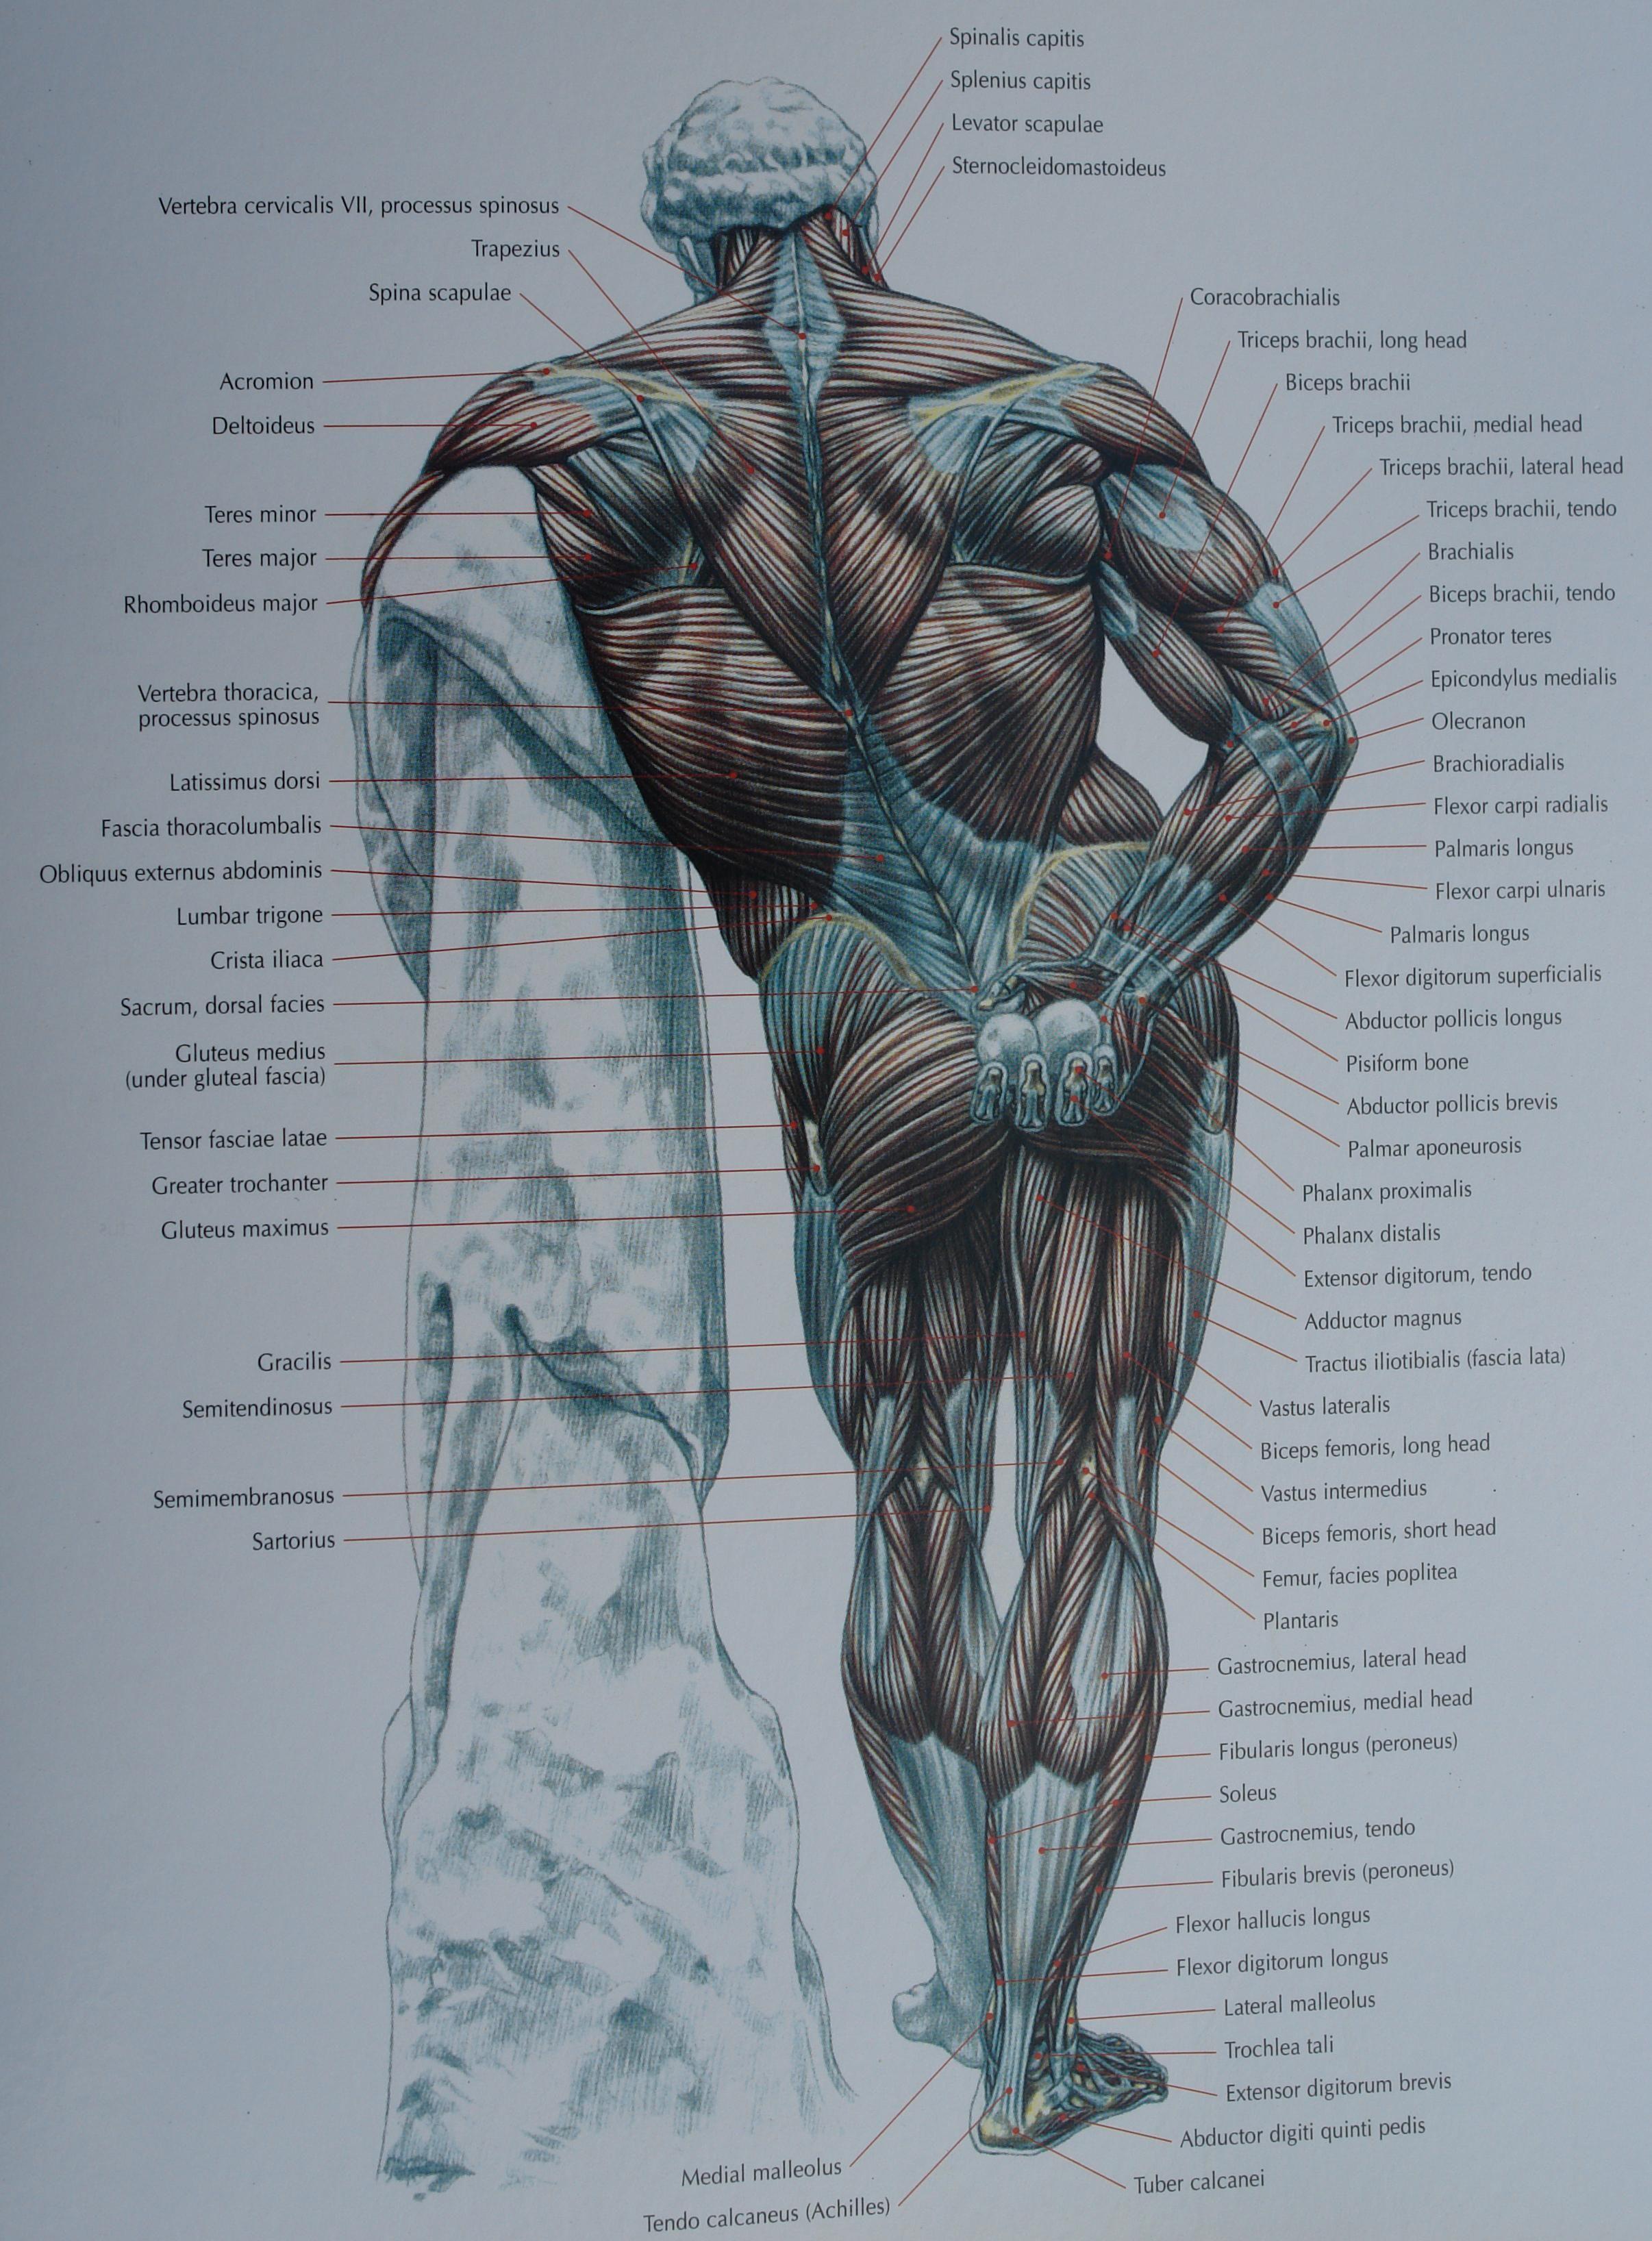 backside | Anatomia | Pinterest | Anatomy, Anatomy reference and ...